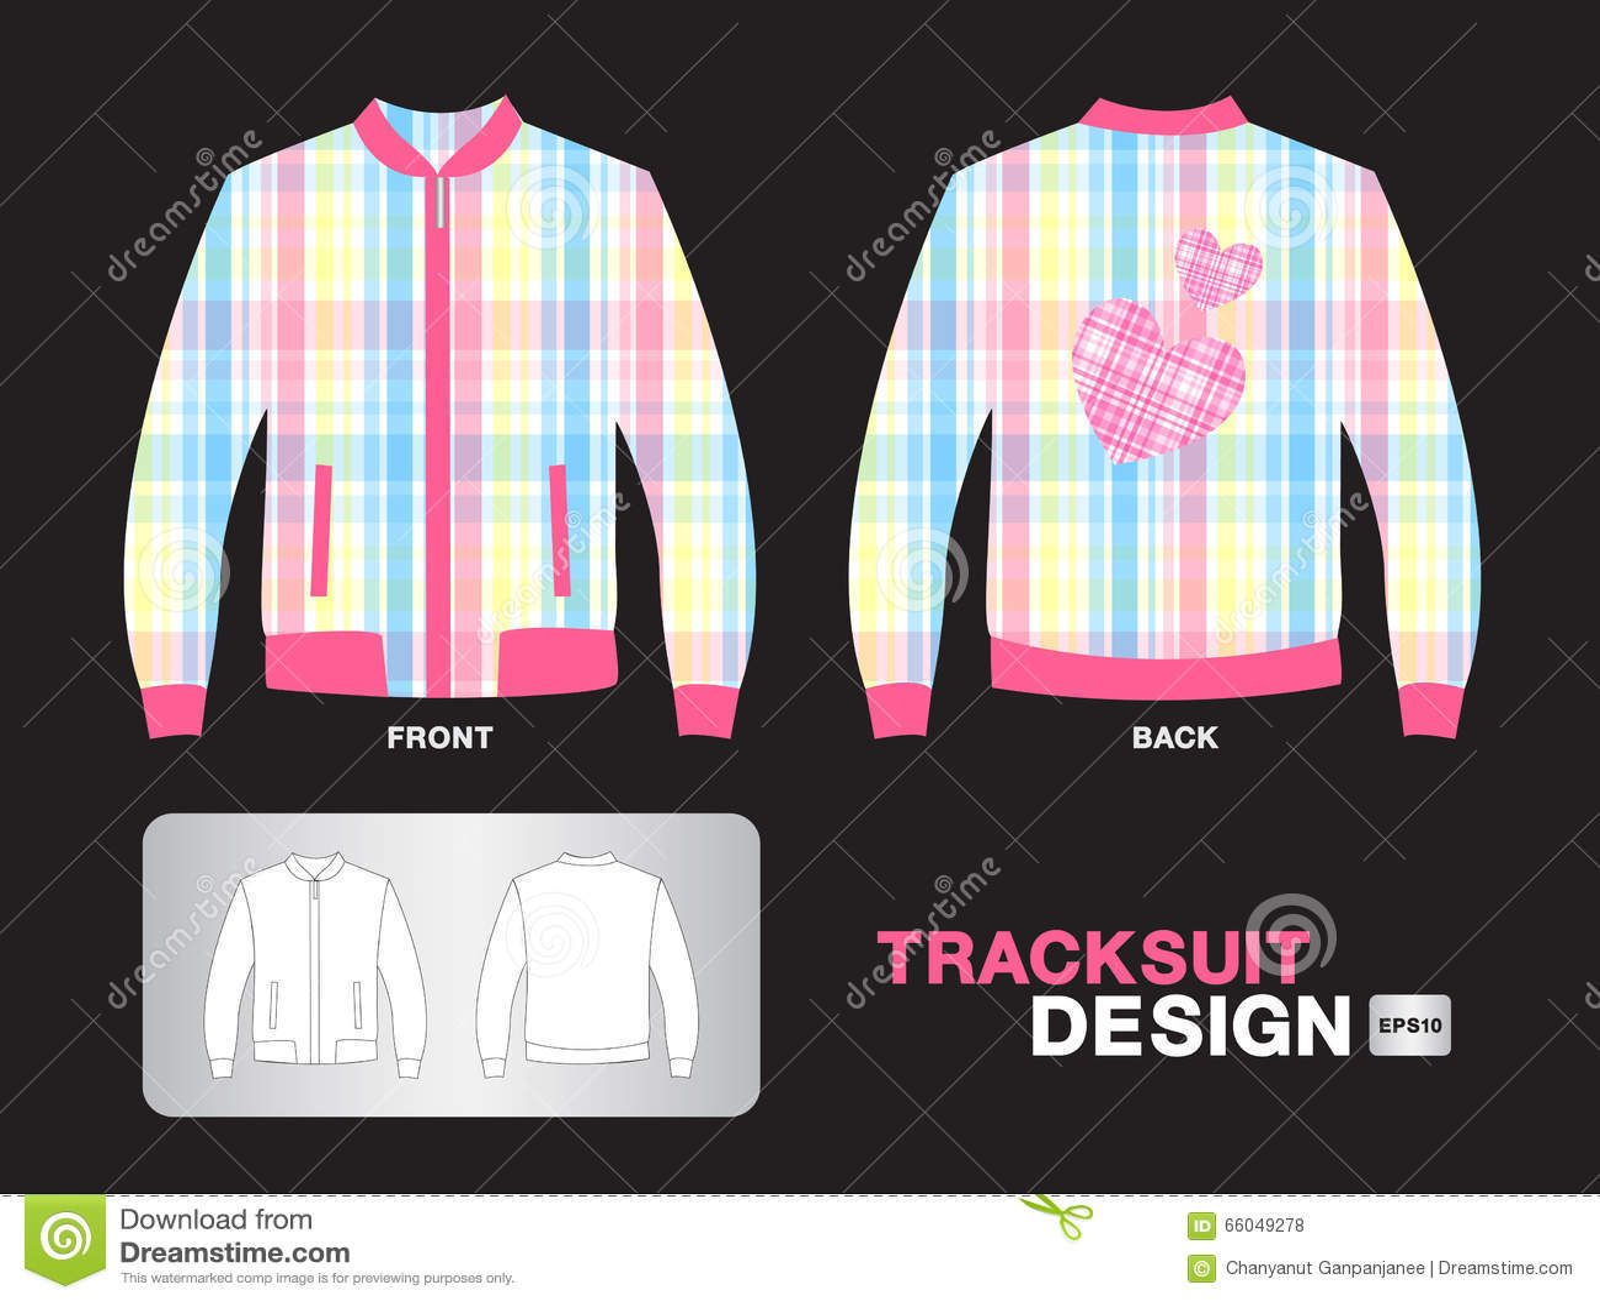 Shirt uniform design vector - Colorful Plaid Tracksuit Design Jacket Vector Illustration Sport T Shirt Uniform Design Clothes Royalty Free